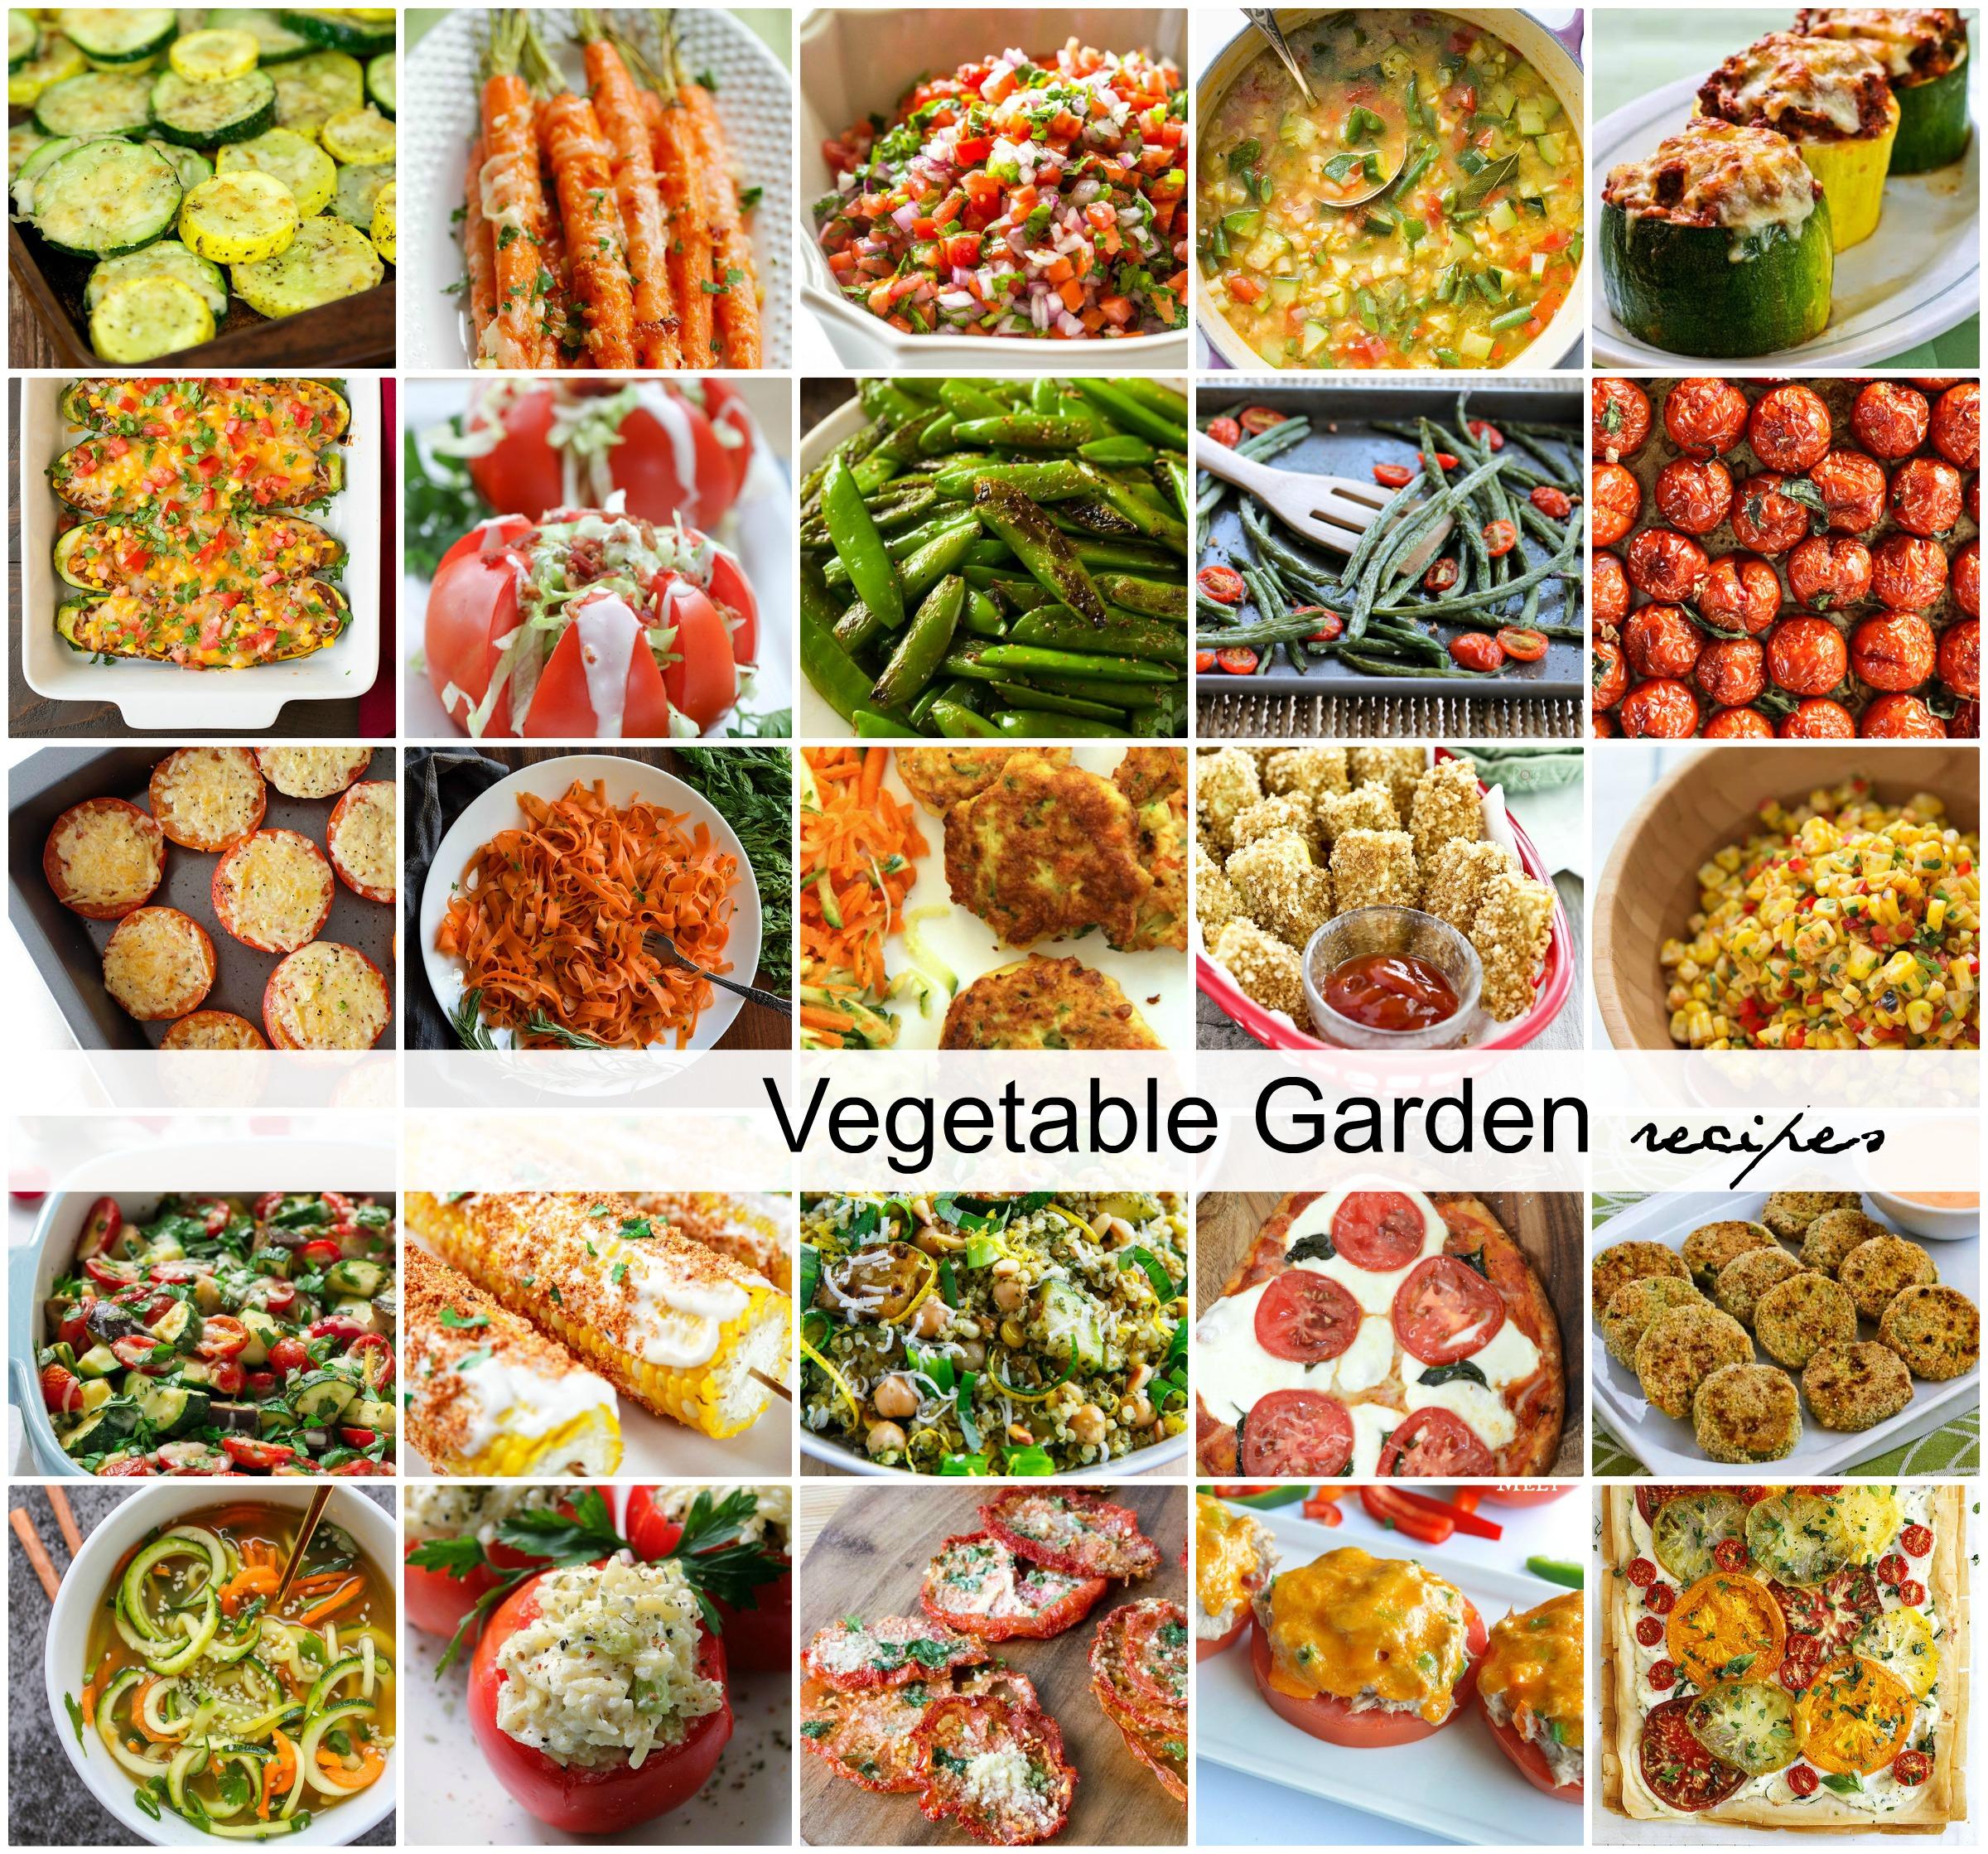 Garden-Fresh-Vegetables-Recipes-1